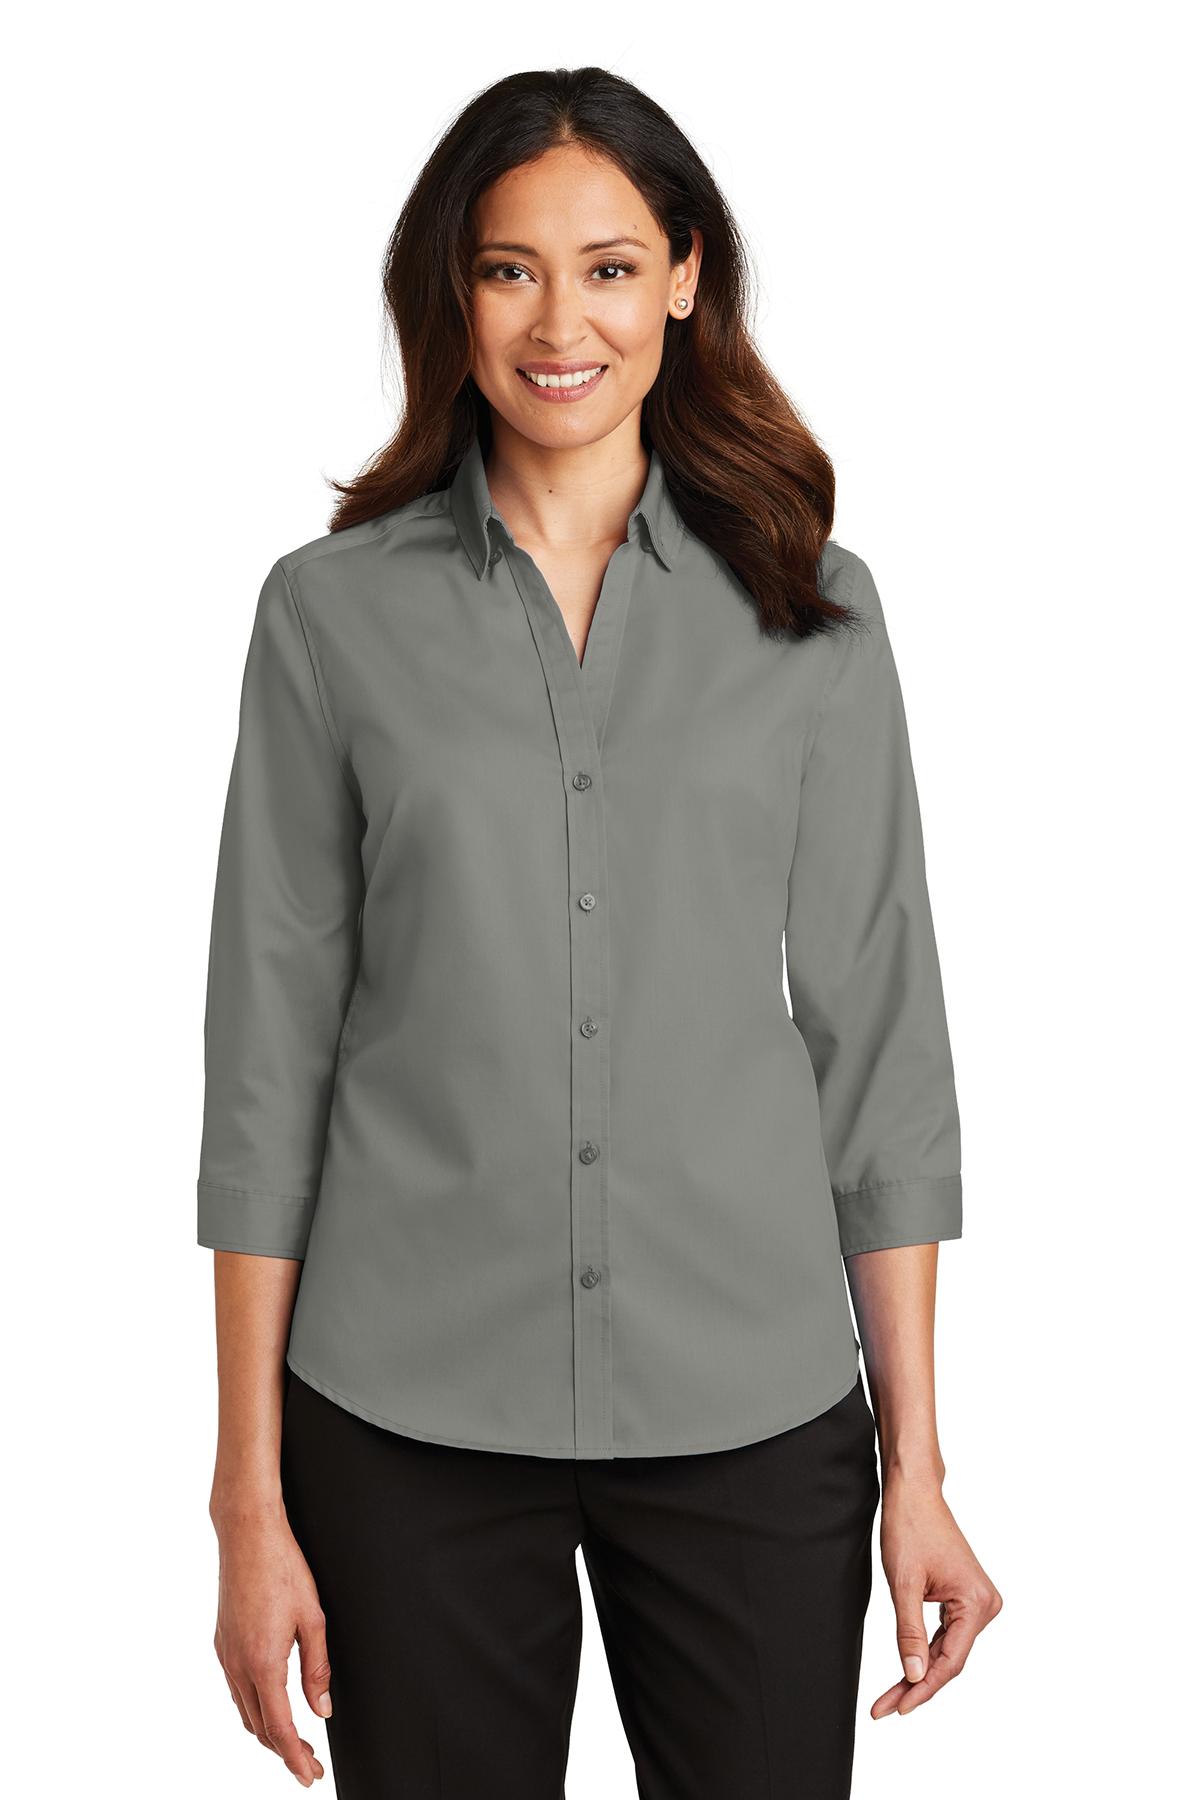 5d3ec577e Port Authority® Ladies 3/4-Sleeve SuperPro™ Twill Shirt | Cotton/Poly ...